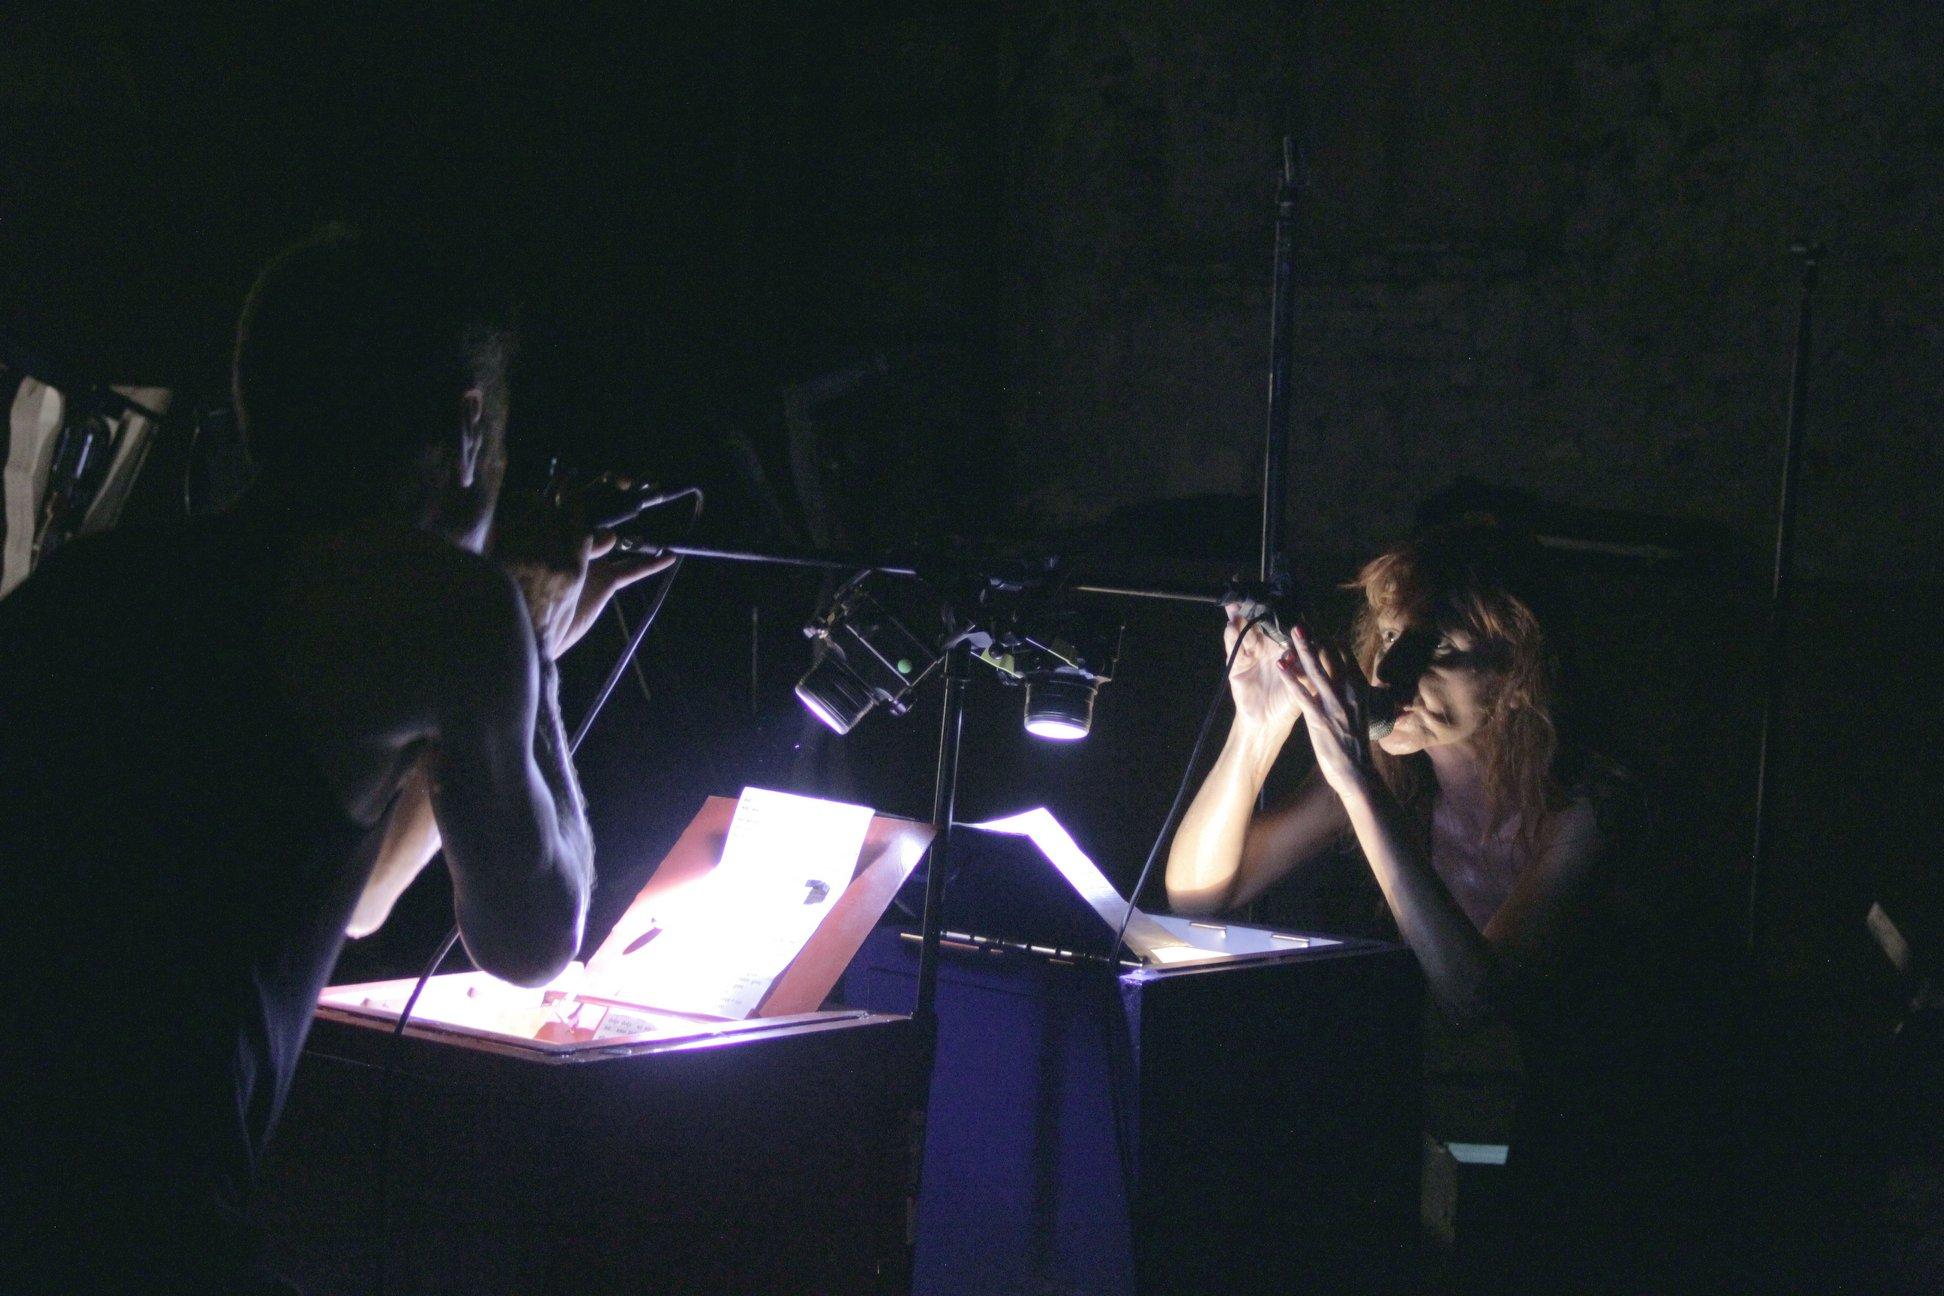 DB Indoš House of Extreme Music Theatre: Hour Spider Rain Tivoli Bewegen - DB Indoš, Tanja Vrvilo